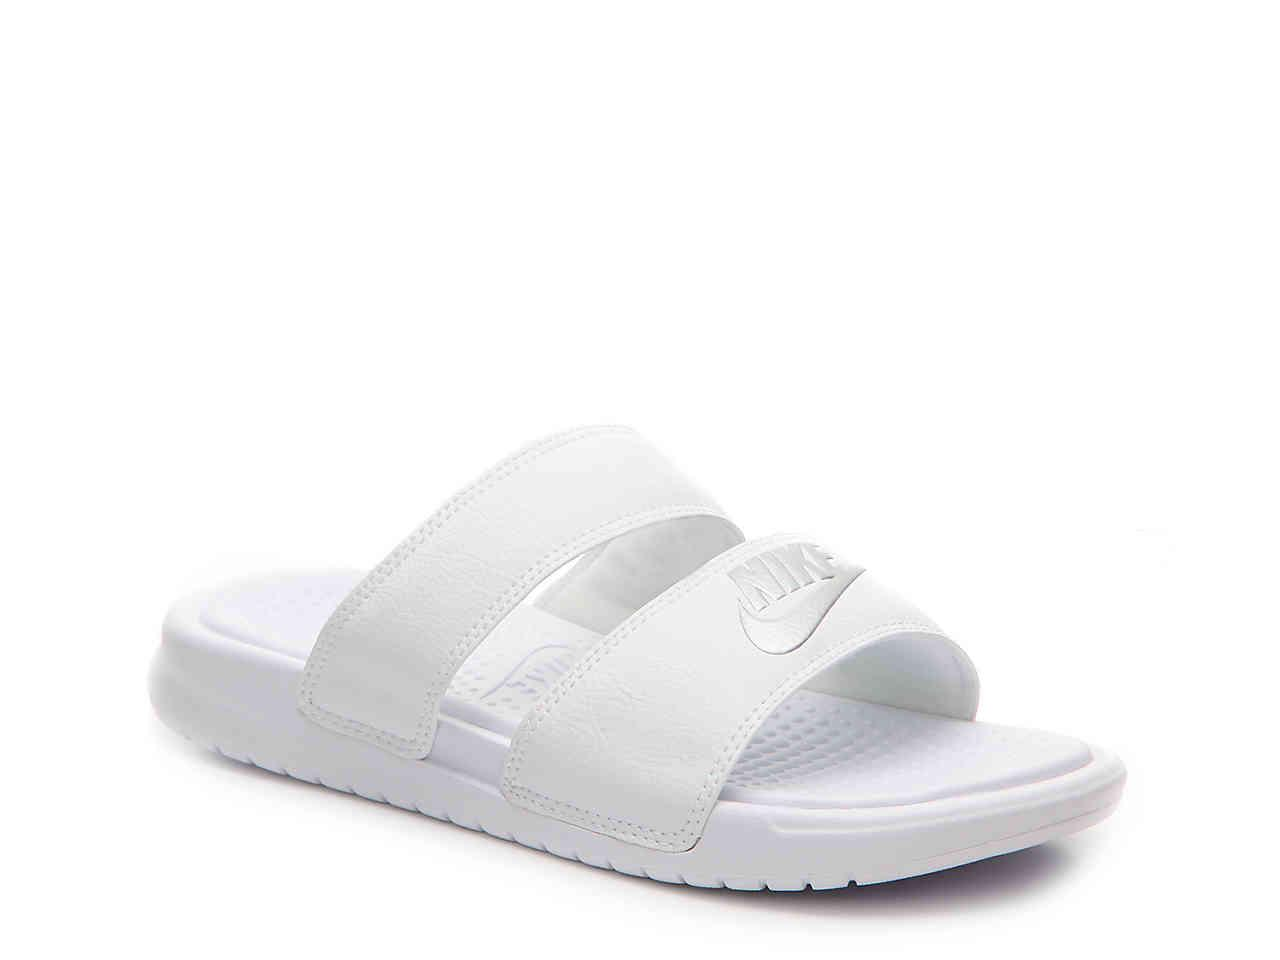 d514032a2 Nike - White Benassi Duo Ultra Slide Sandal - Lyst. View fullscreen